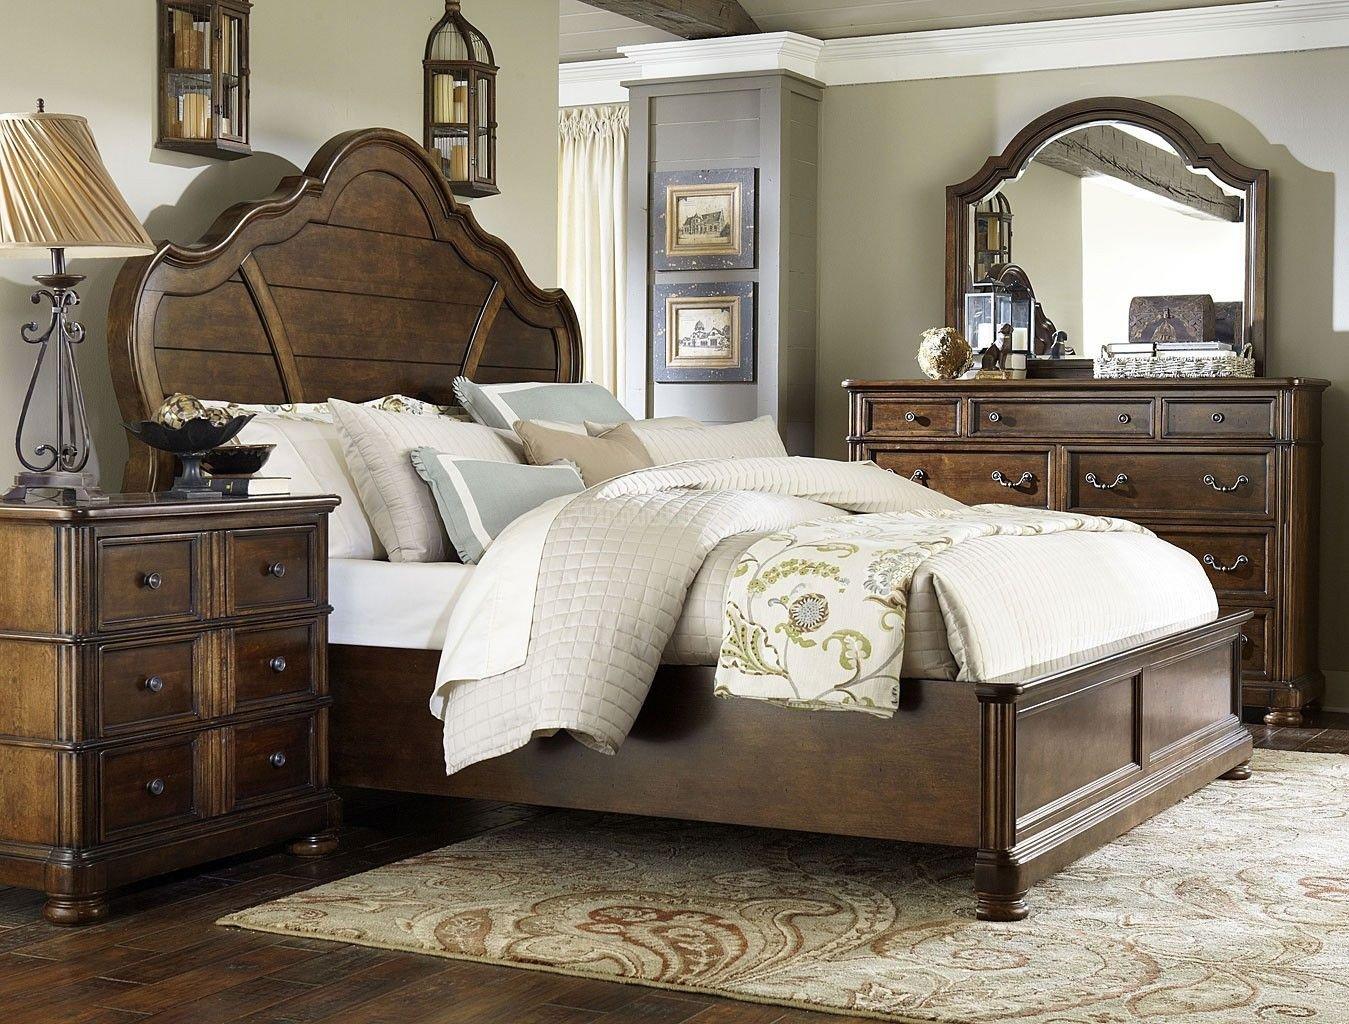 Affordable King Bedroom Set Luxury Summerfield Panel Bedroom Set